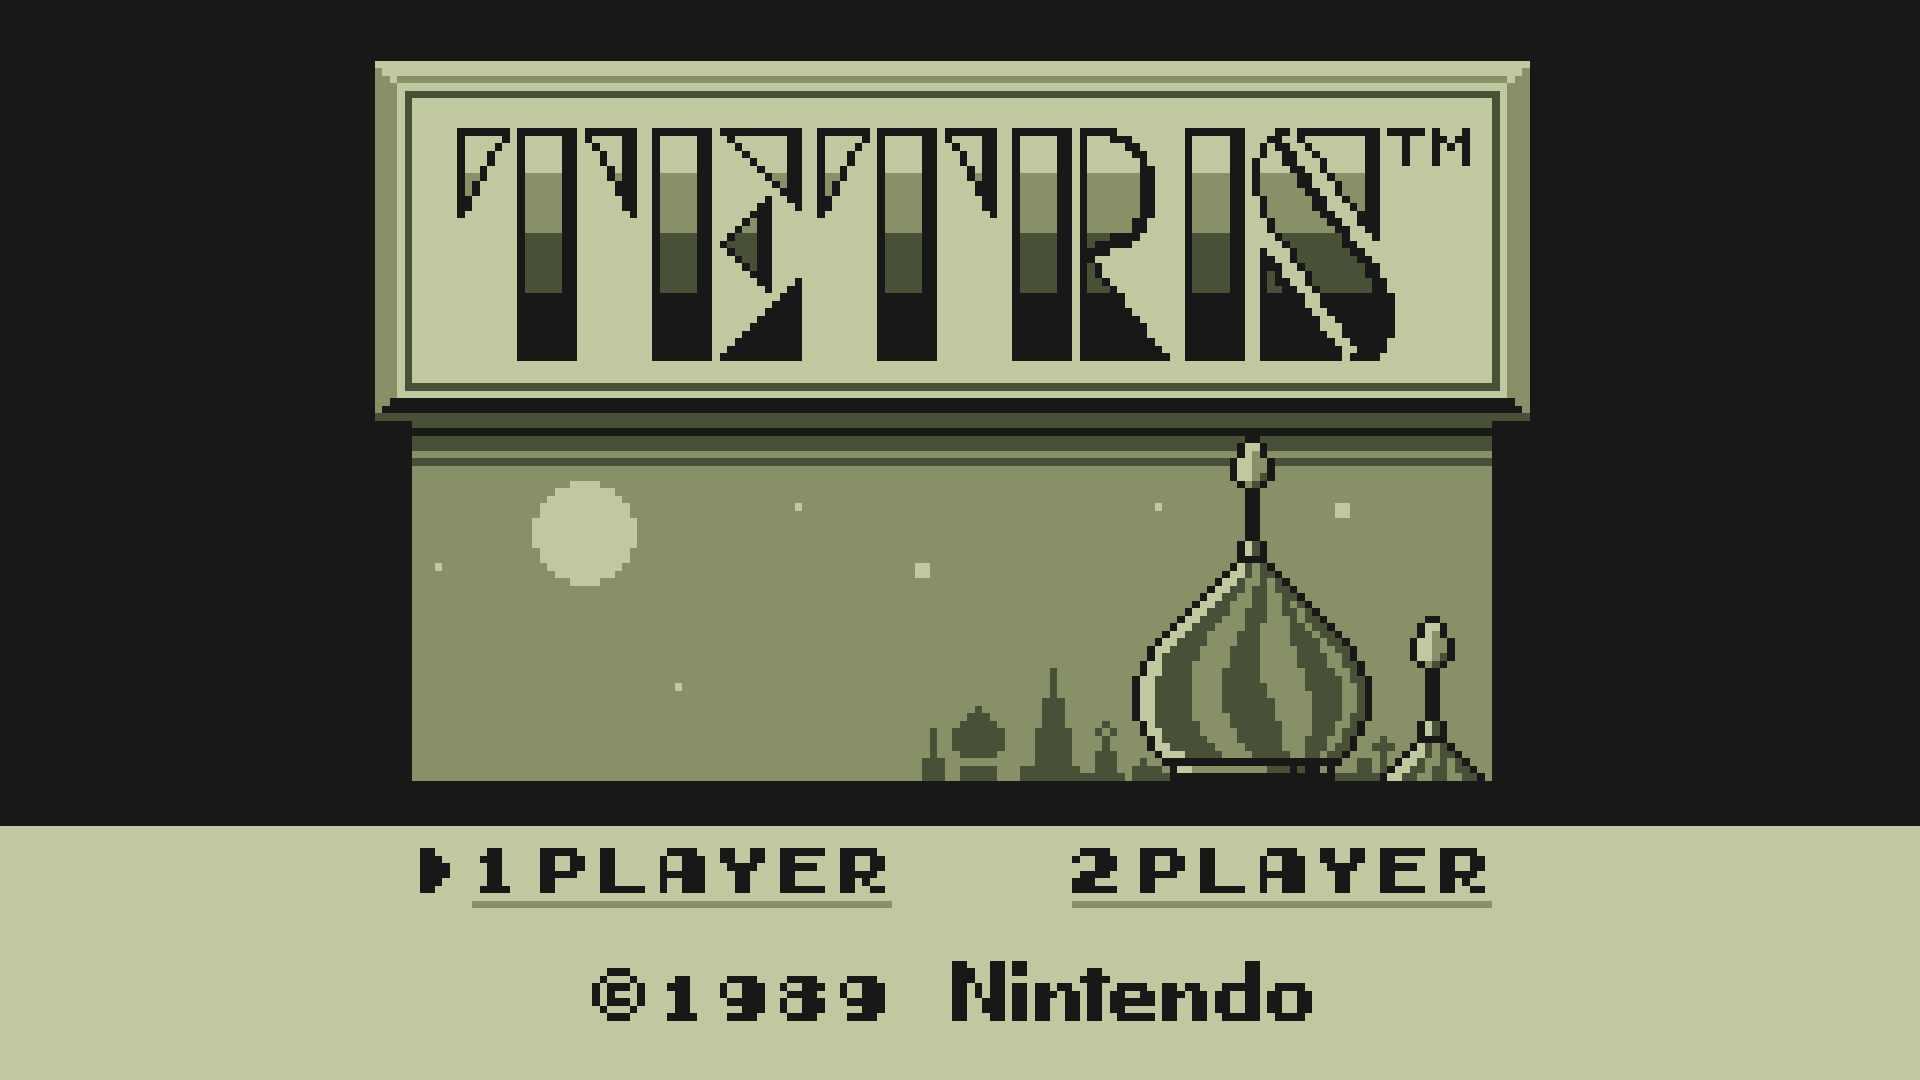 Tetris done right